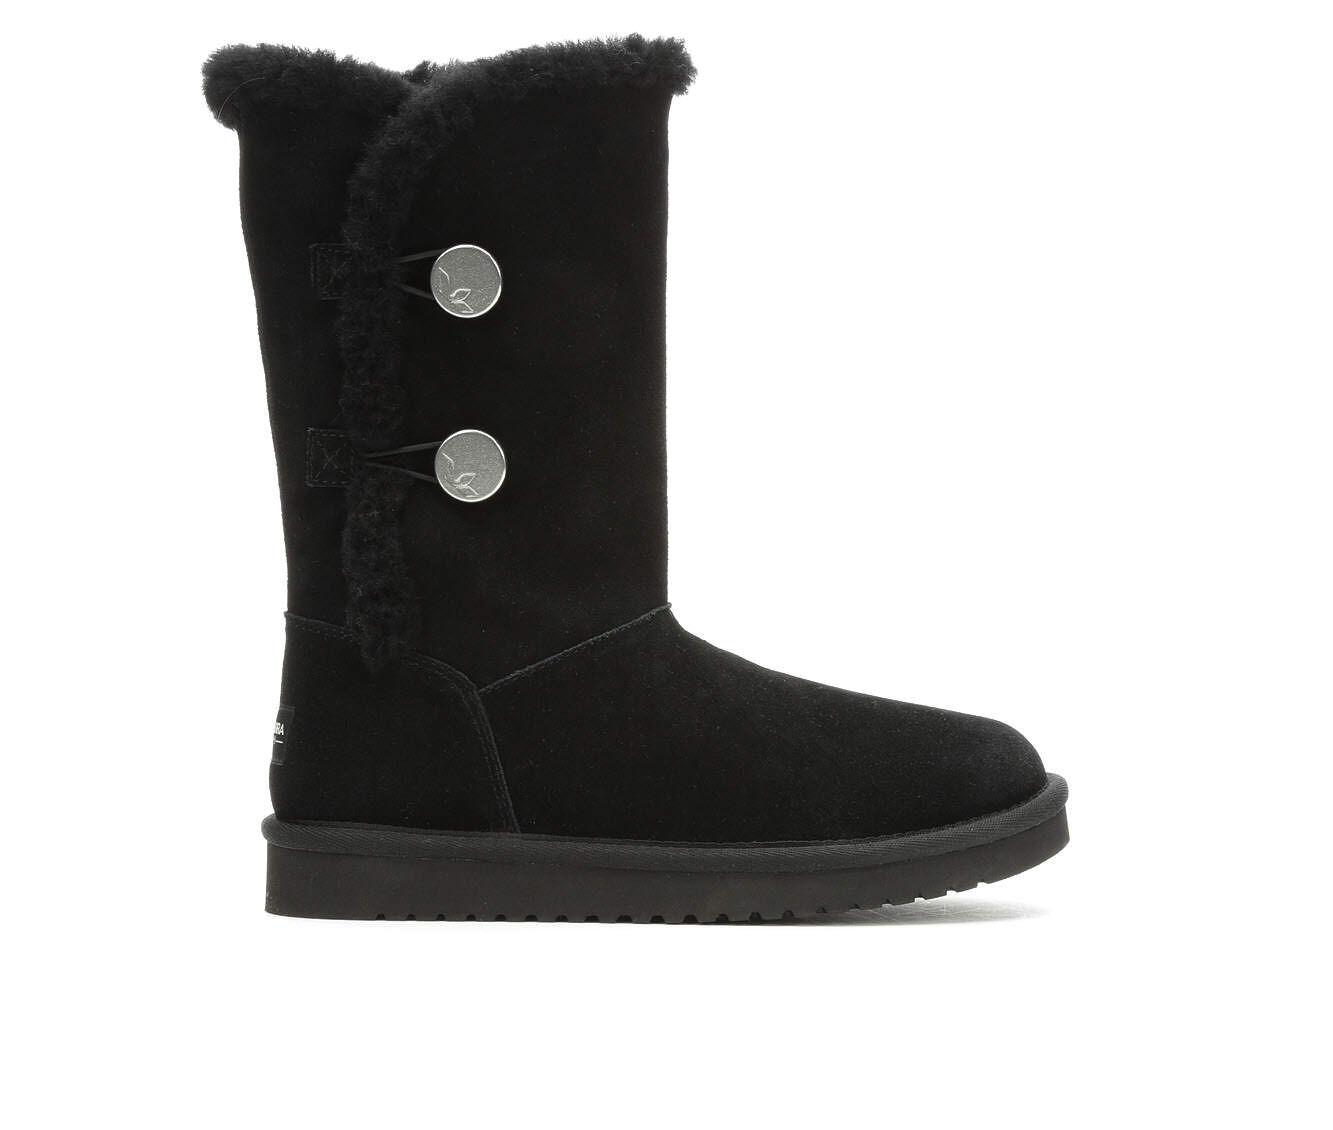 choose latest series Women's Koolaburra by UGG Kinslei Tall Boots Black/Black